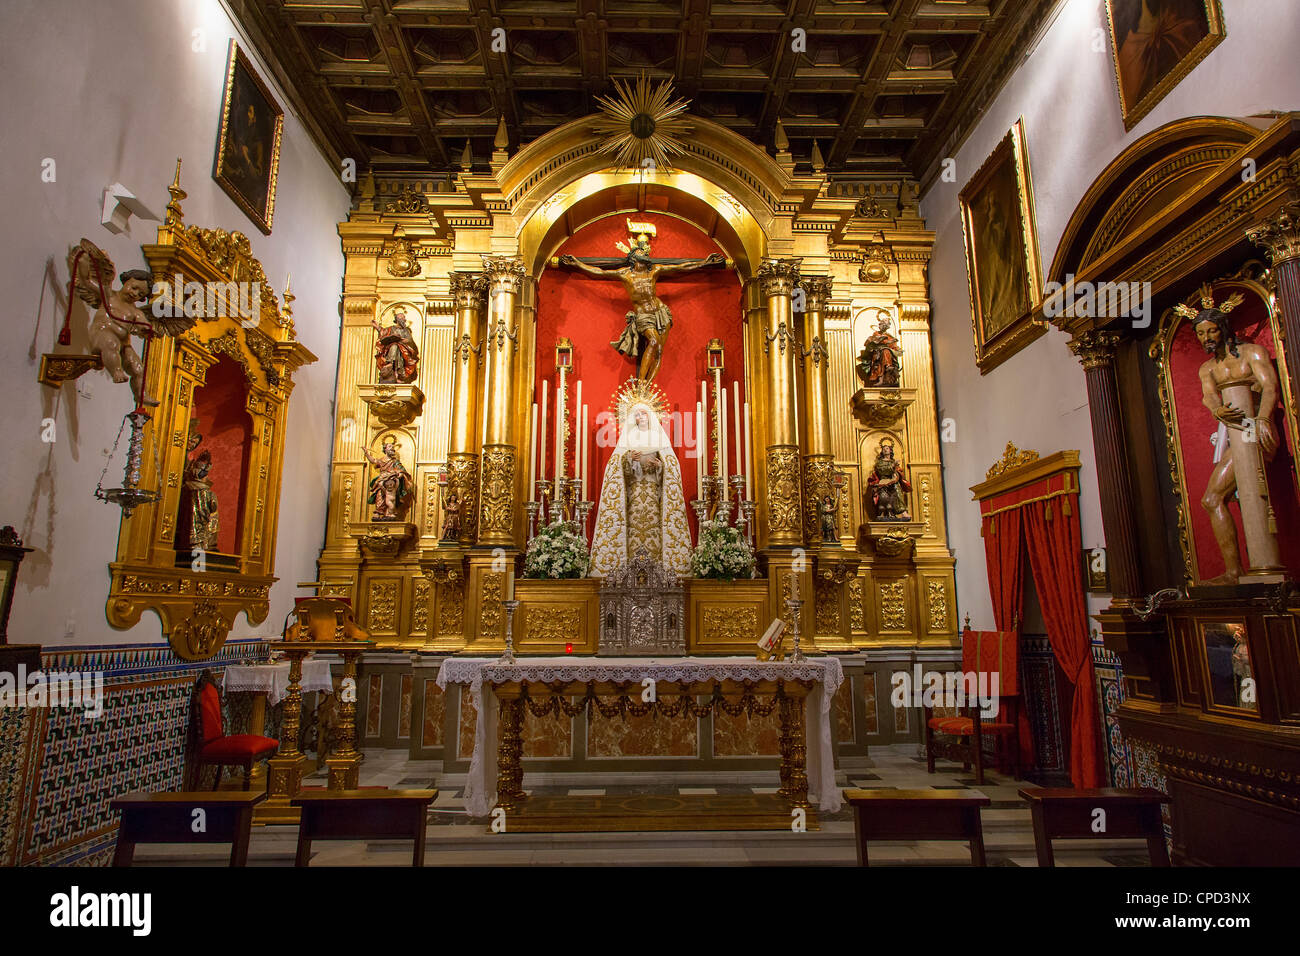 Seville, Iglesia de museo de bellas Artes - Stock Image